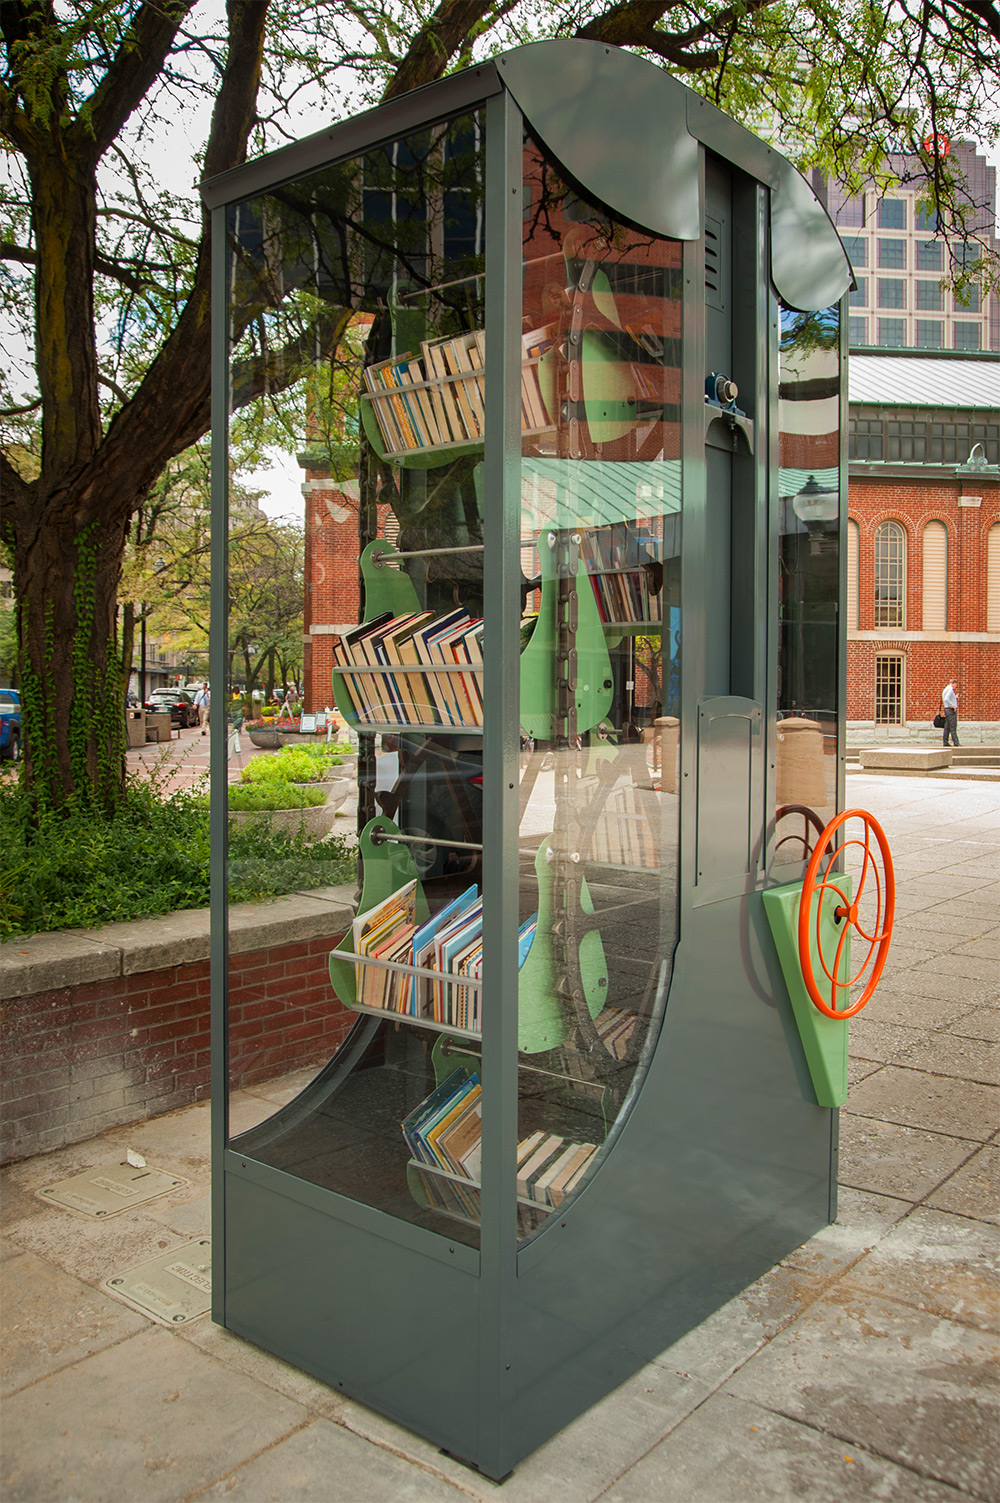 book-sharing-artisti-mini-librerie-indianapolis-4